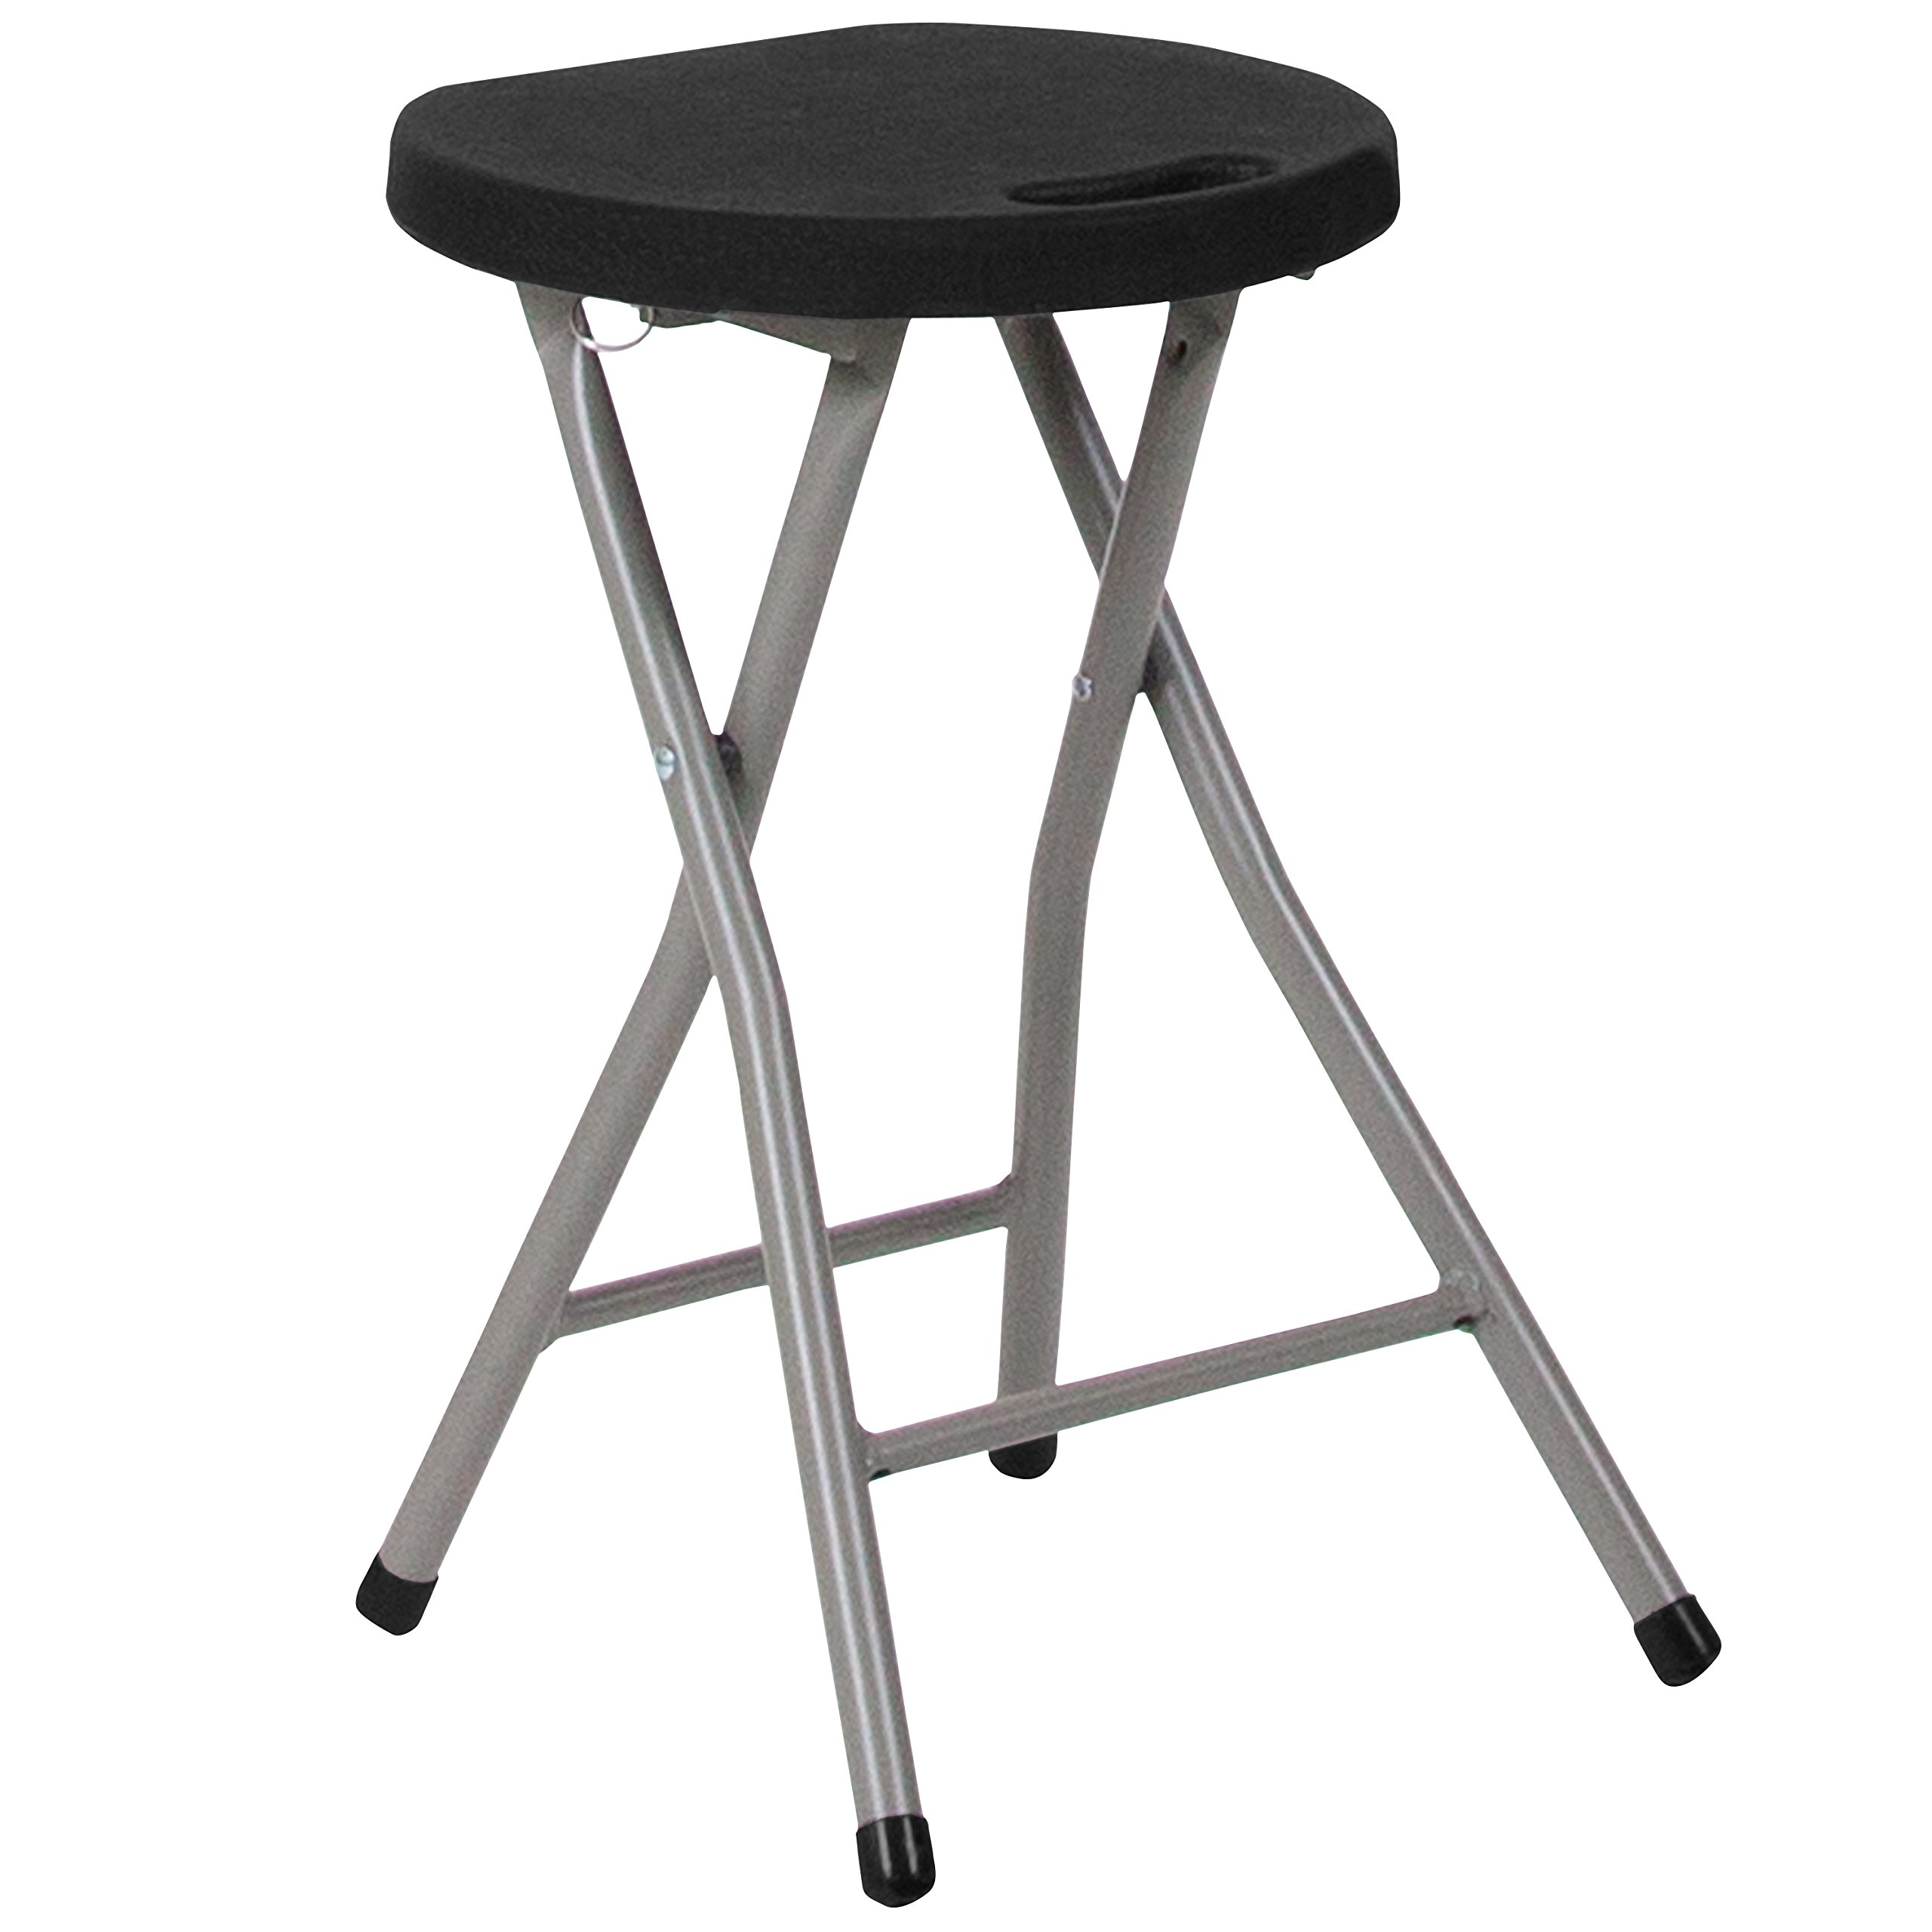 Flash Furniture Foldable Stool with Black Plastic Seat and Titanium Frame